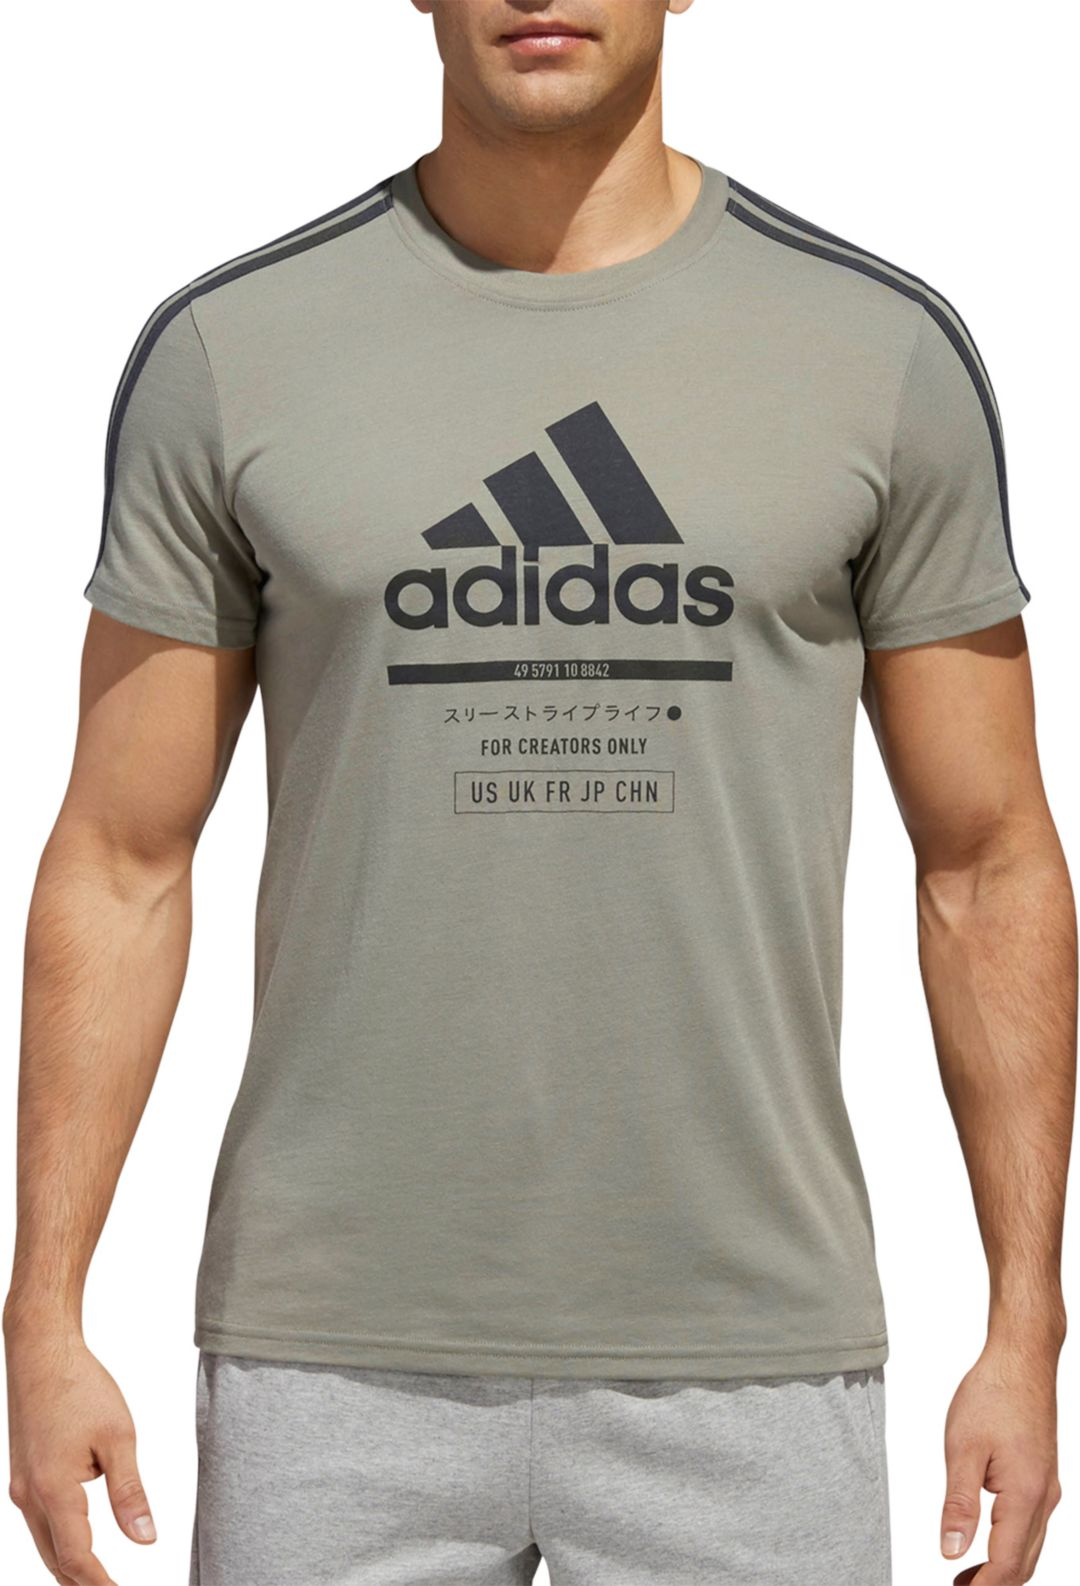 44a66c59b5 adidas Men's Classic International T-Shirt